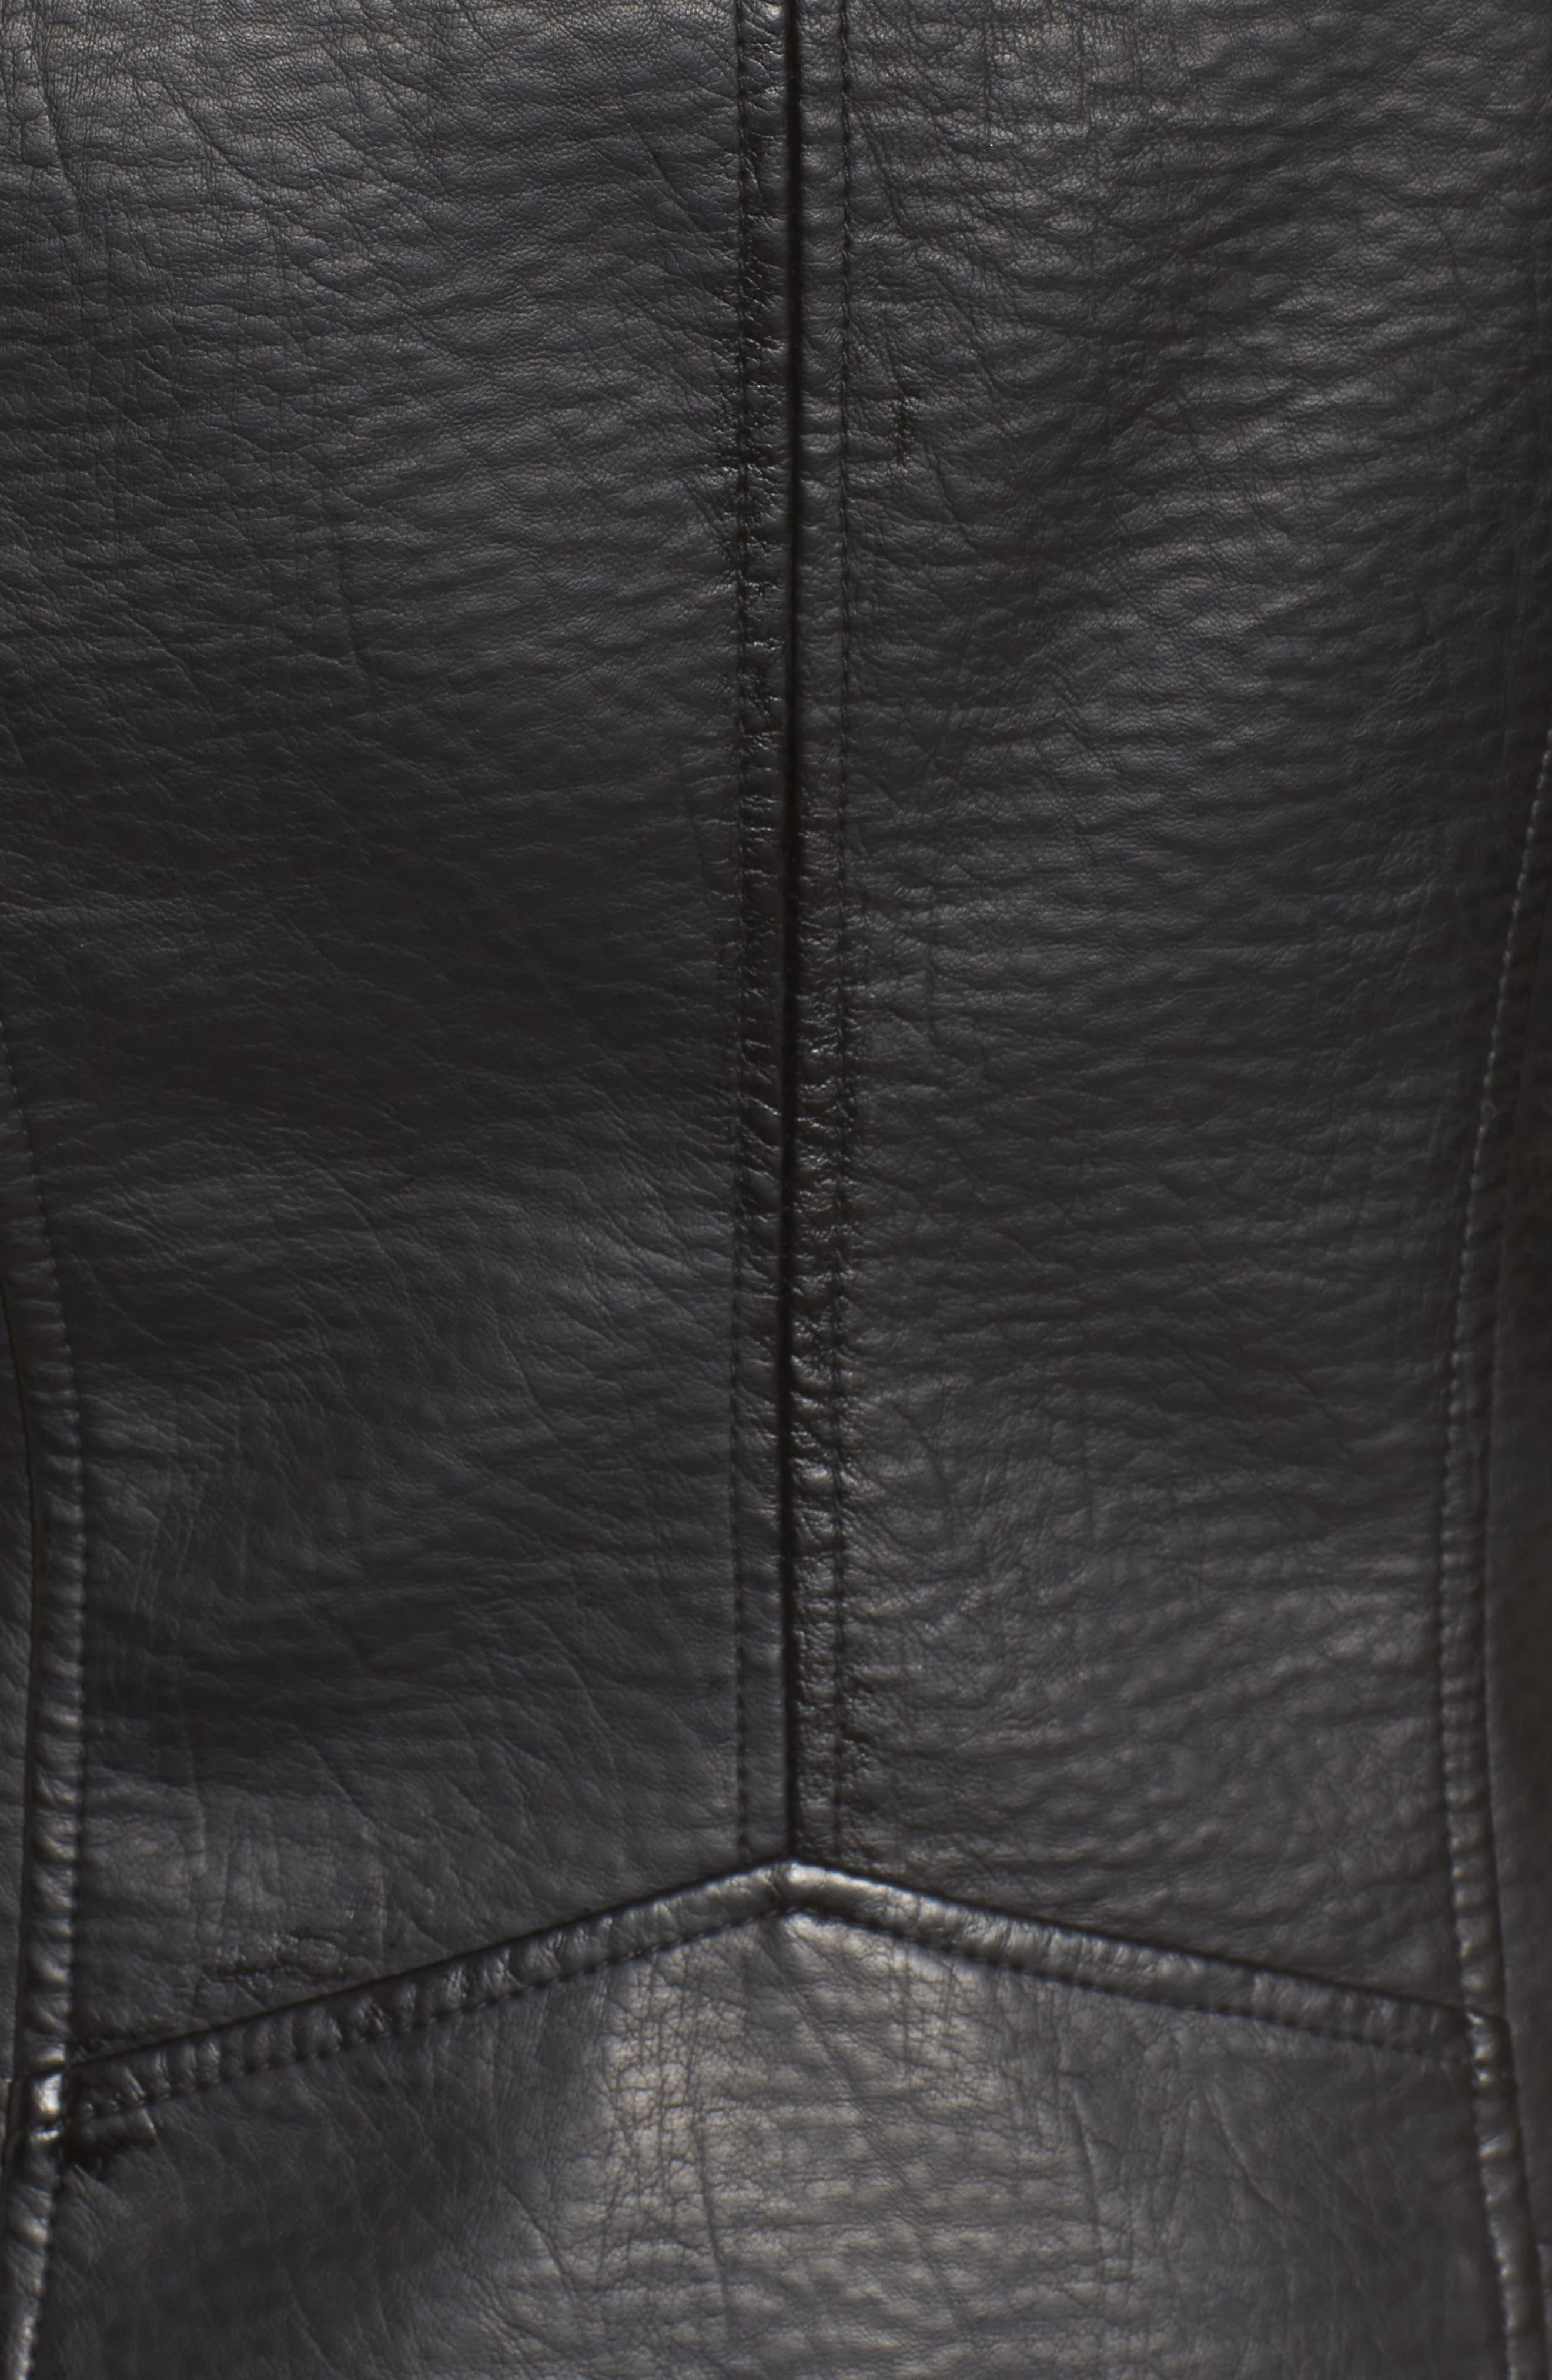 Textured Faux Leather Jacket with Removable Faux Fur Trim,                             Alternate thumbnail 6, color,